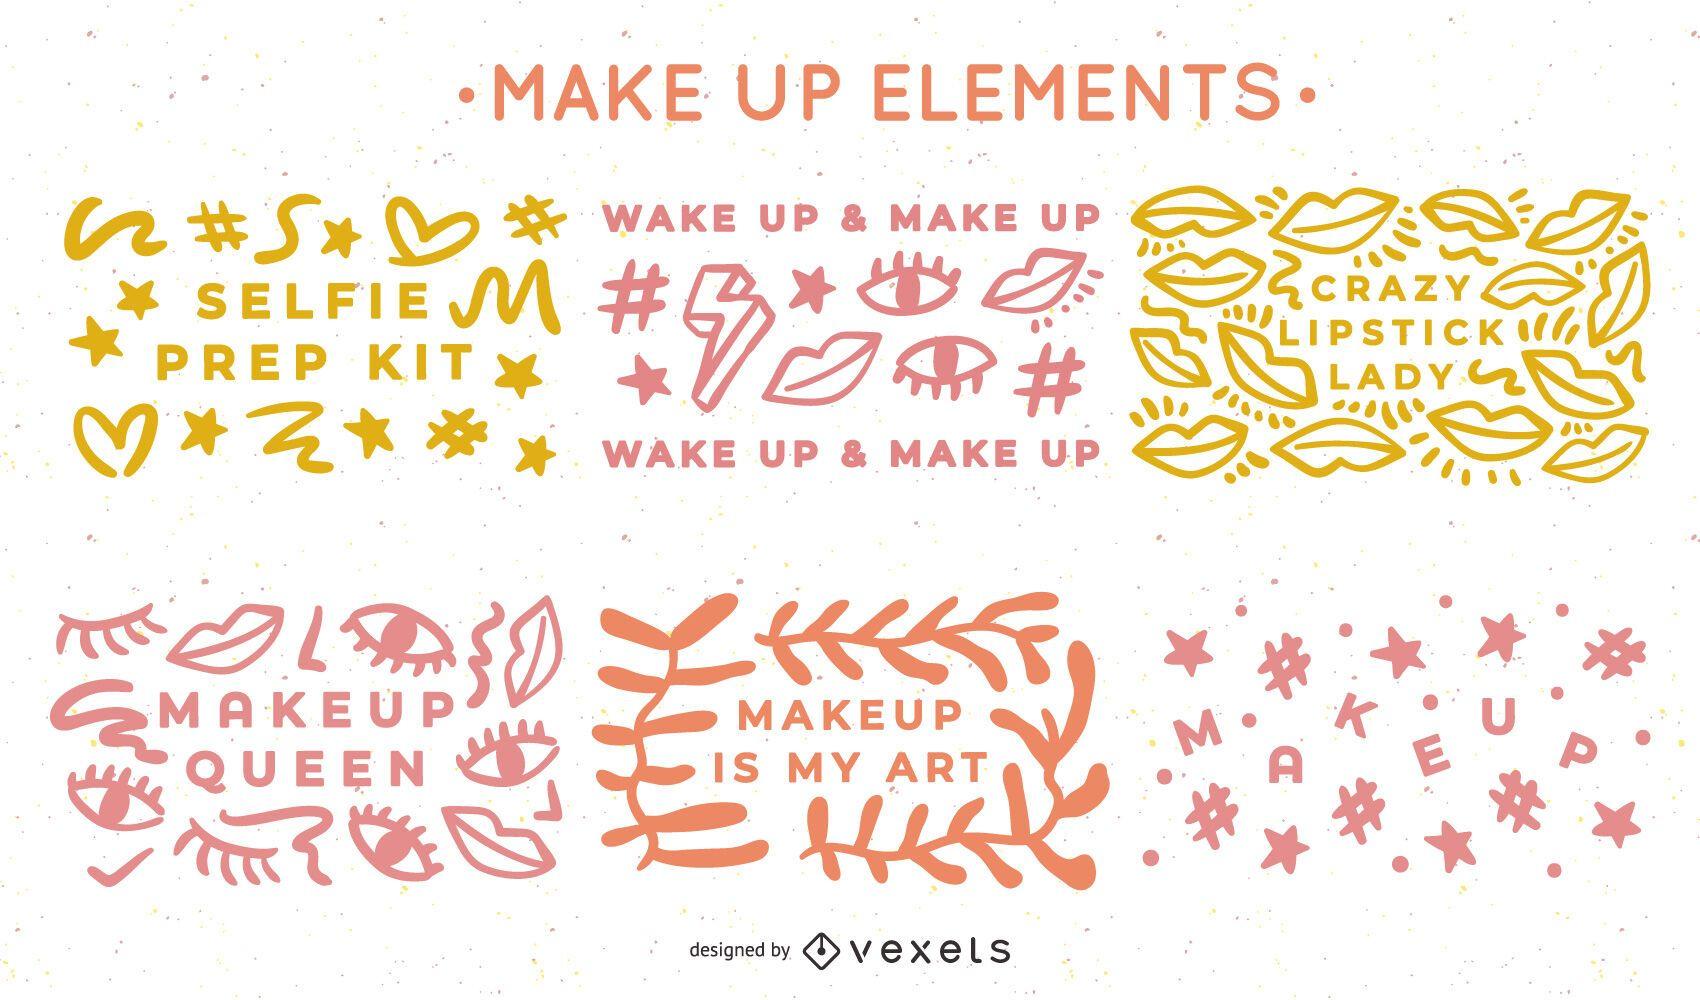 Makeup Elements Design Pack